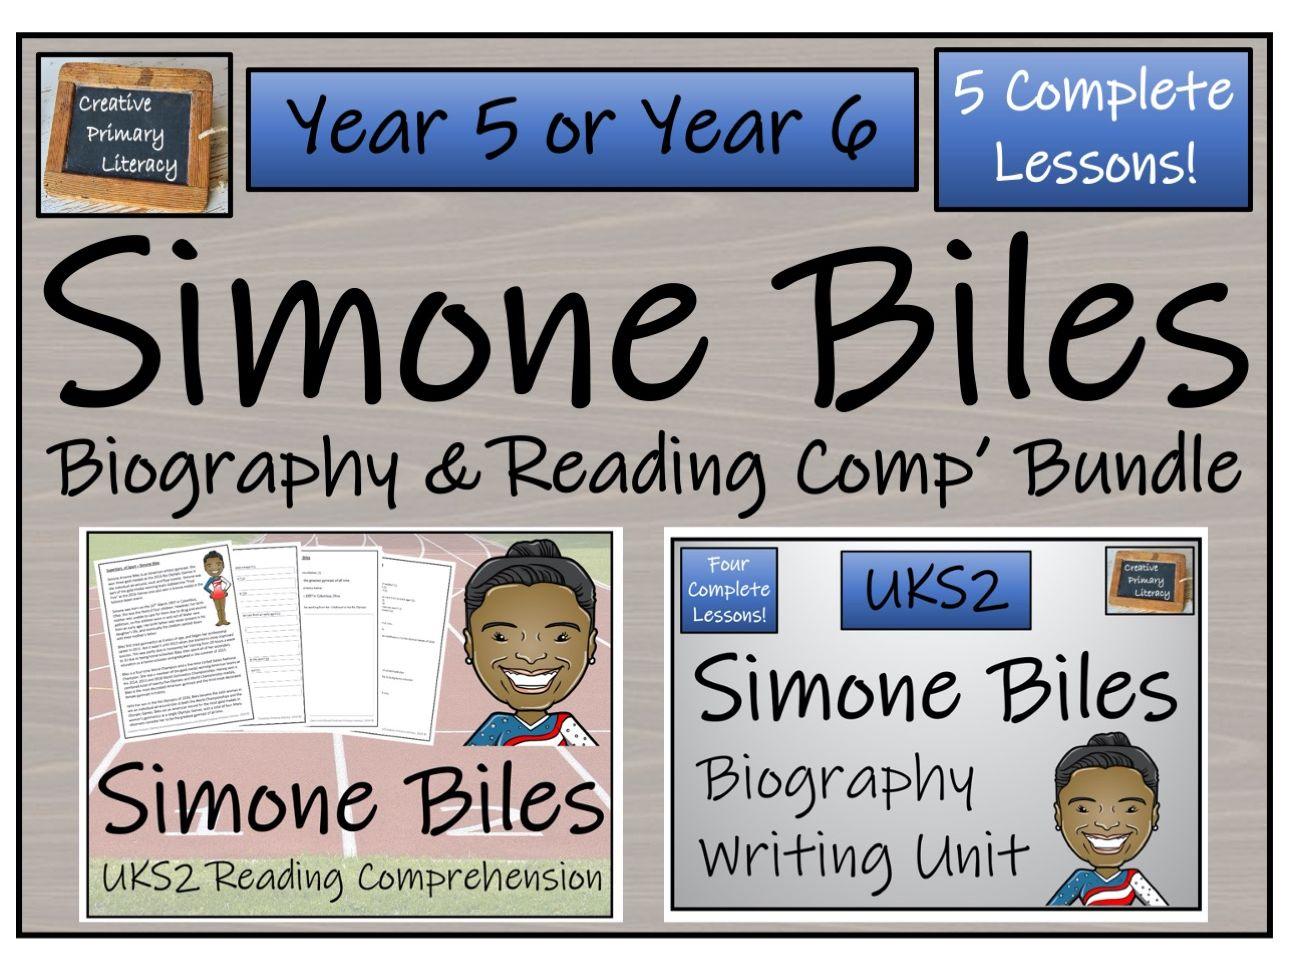 UKS2 Simone Biles Reading Comprehension & Biography Unit Bundle